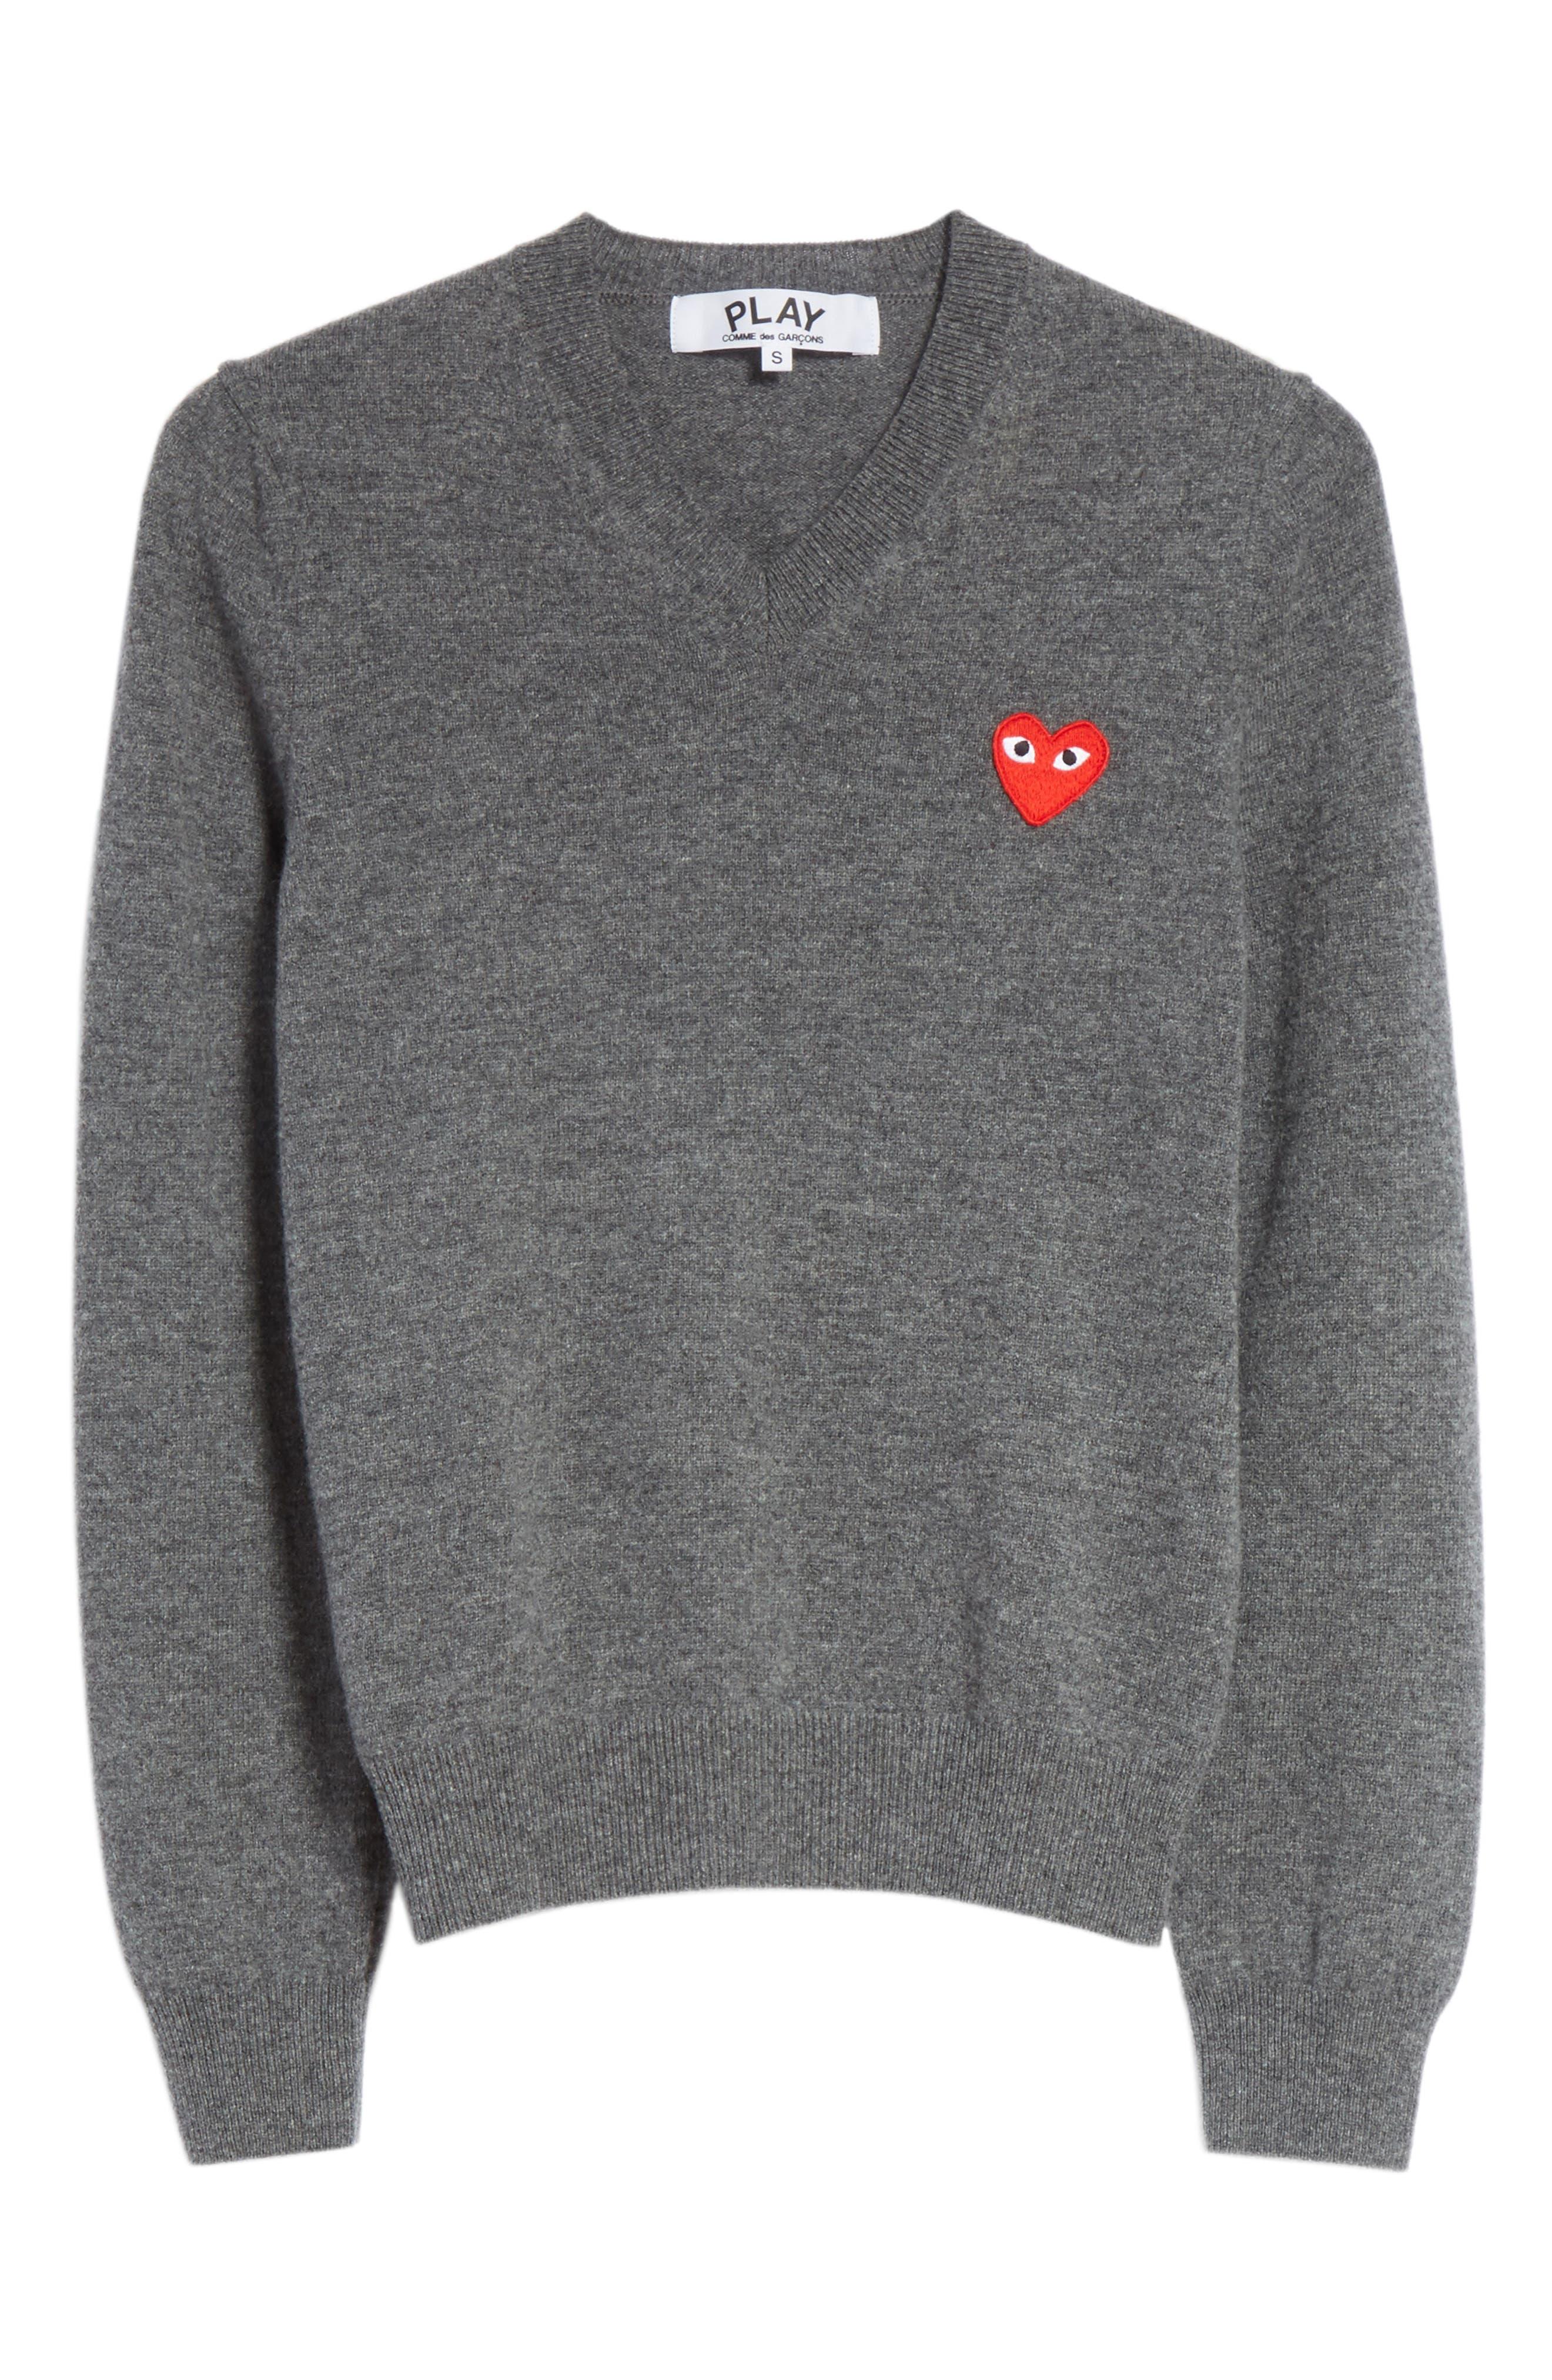 Comme des Garçons PLAY Wool V-Neck Sweater,                             Alternate thumbnail 6, color,                             Grey